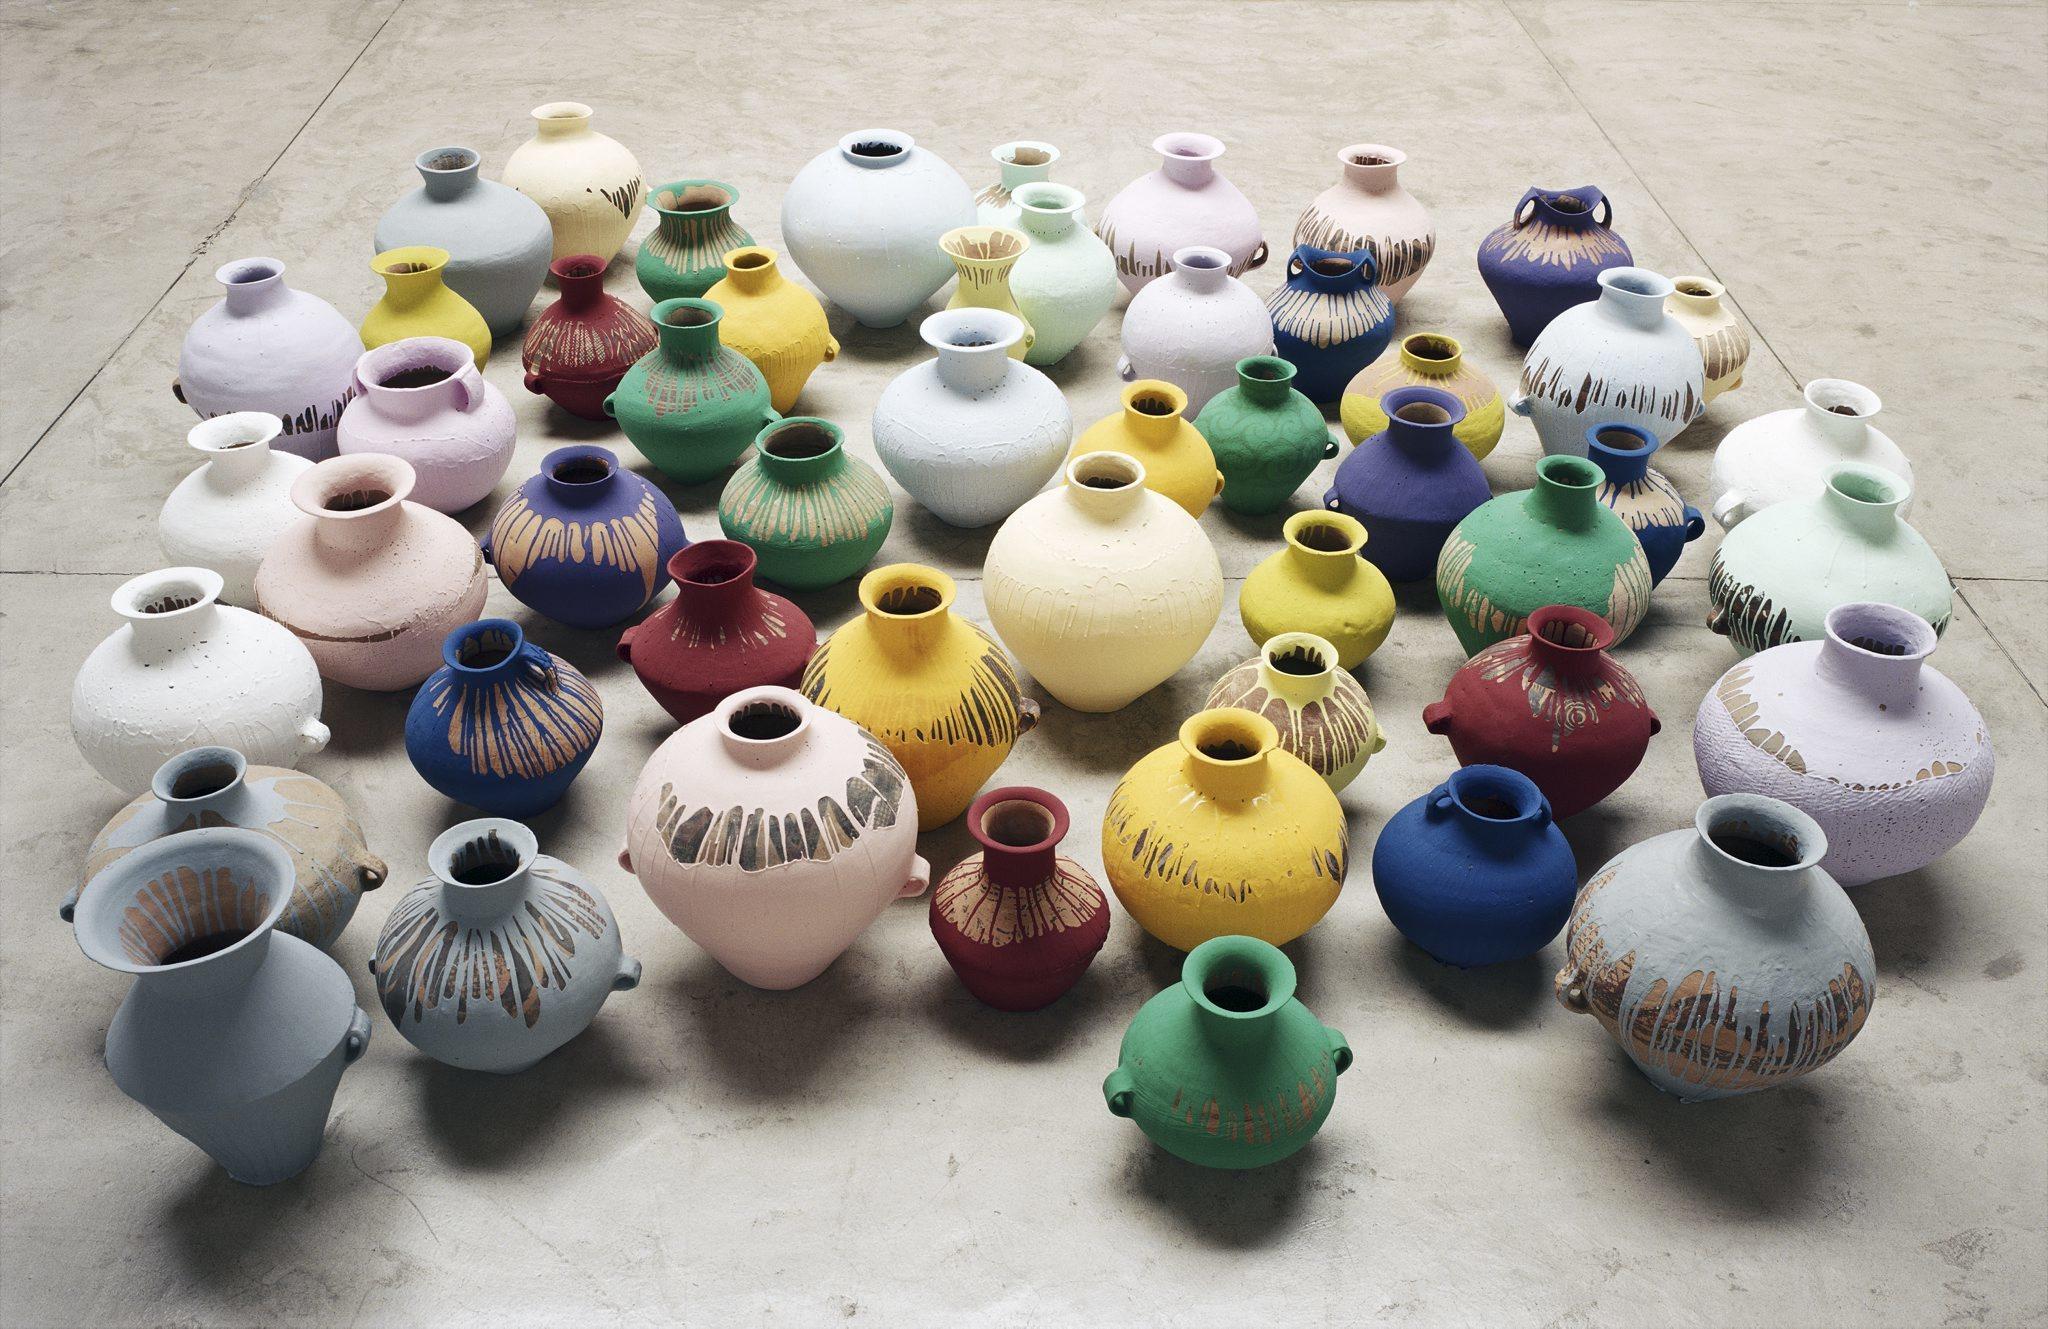 (Ai Weiwei: 'Coloured Vases', 2006. ©Ai Weiwei)